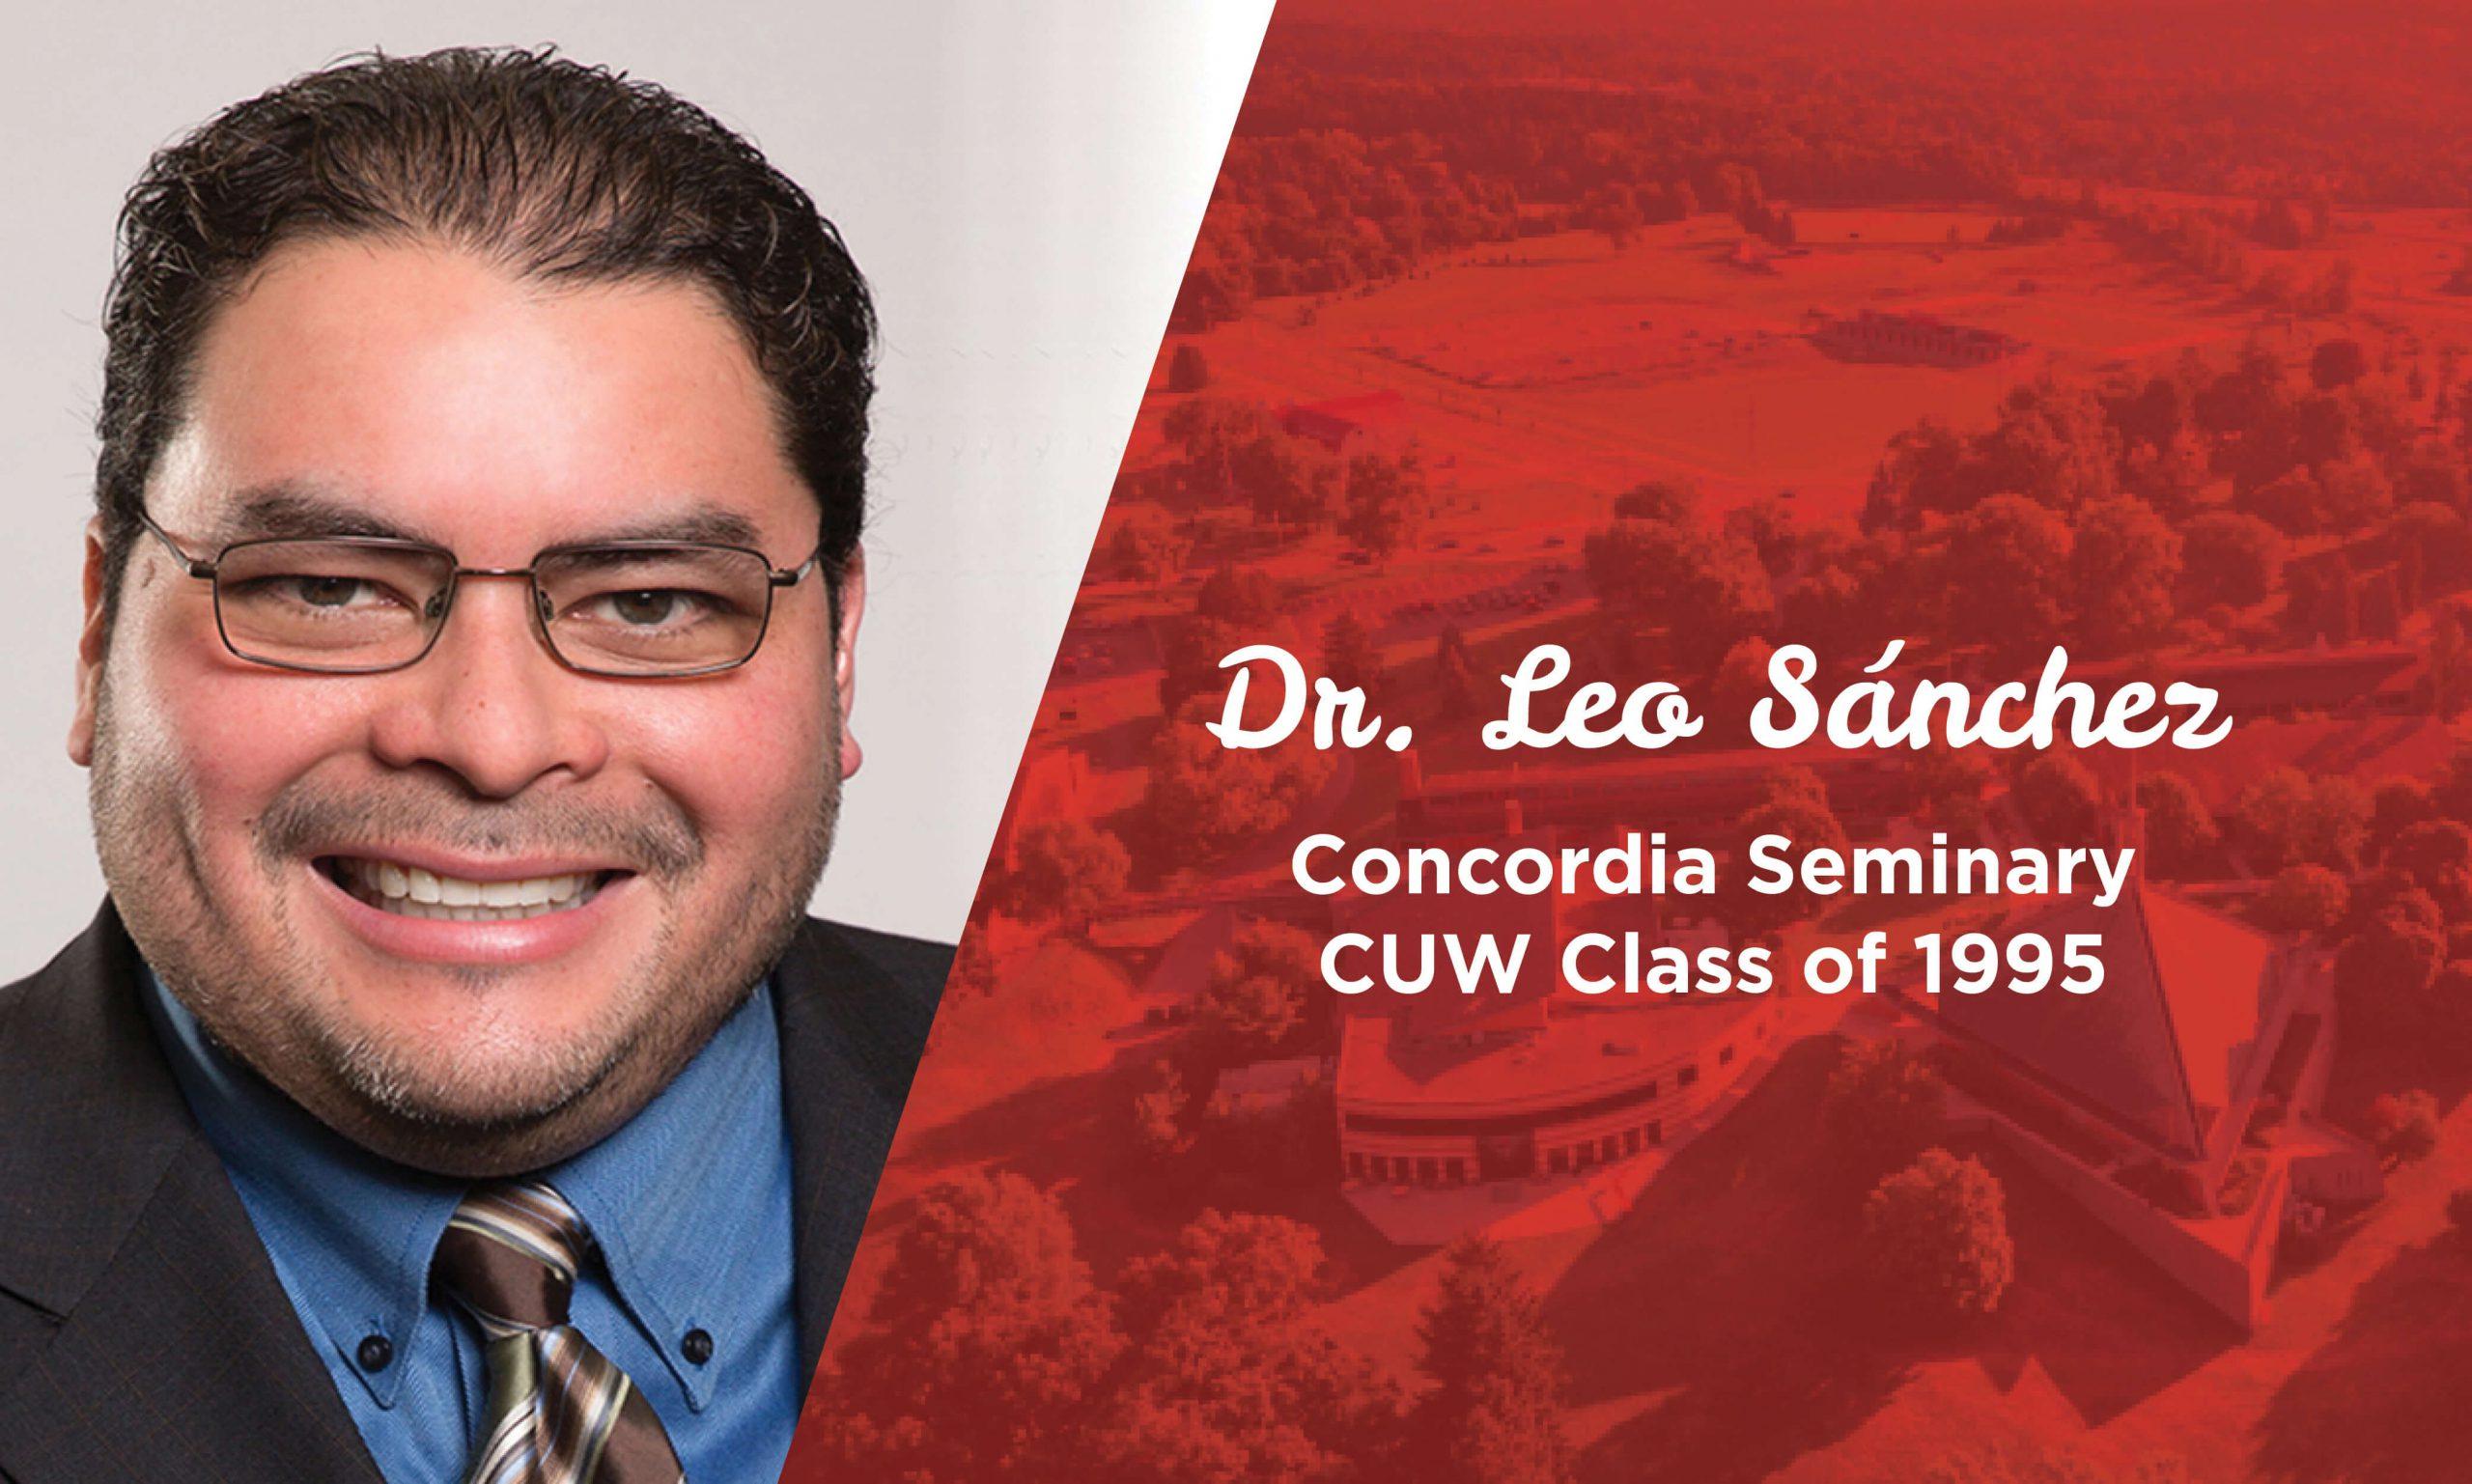 Spirit christology with Leo Sanchez